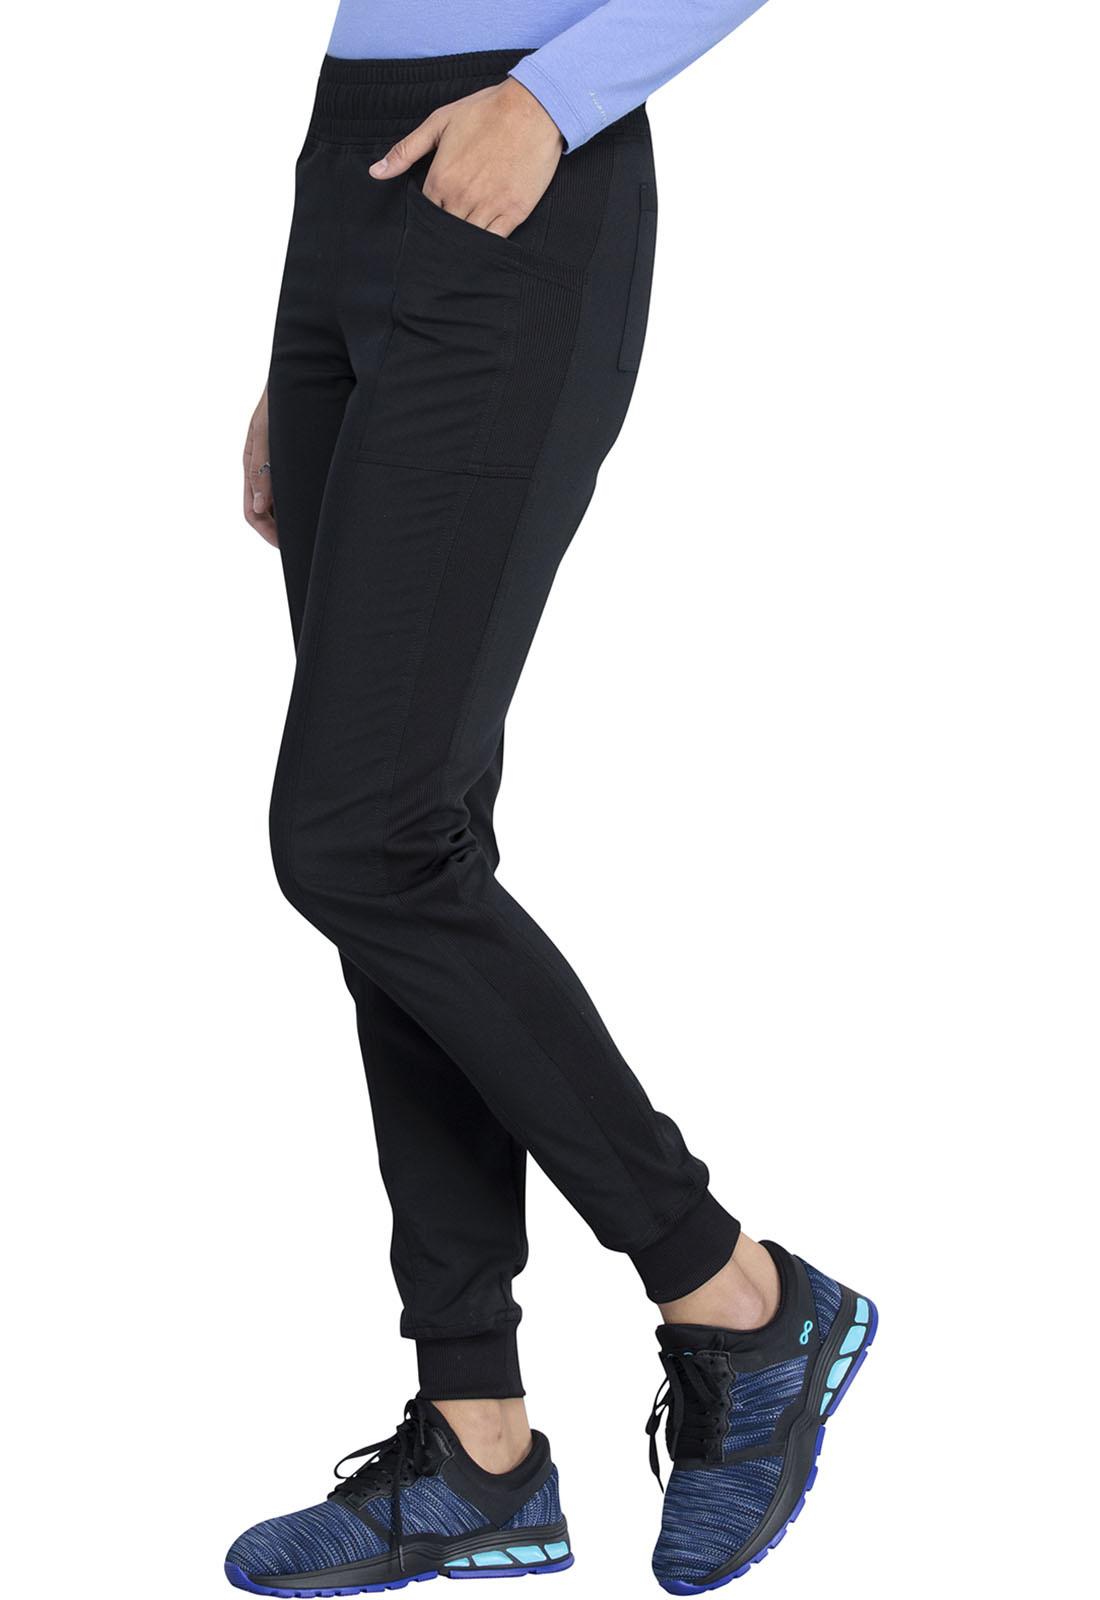 DICKIES Mid Rise Tall Women's Jogger Scrub Pants Black DK155T-BLK